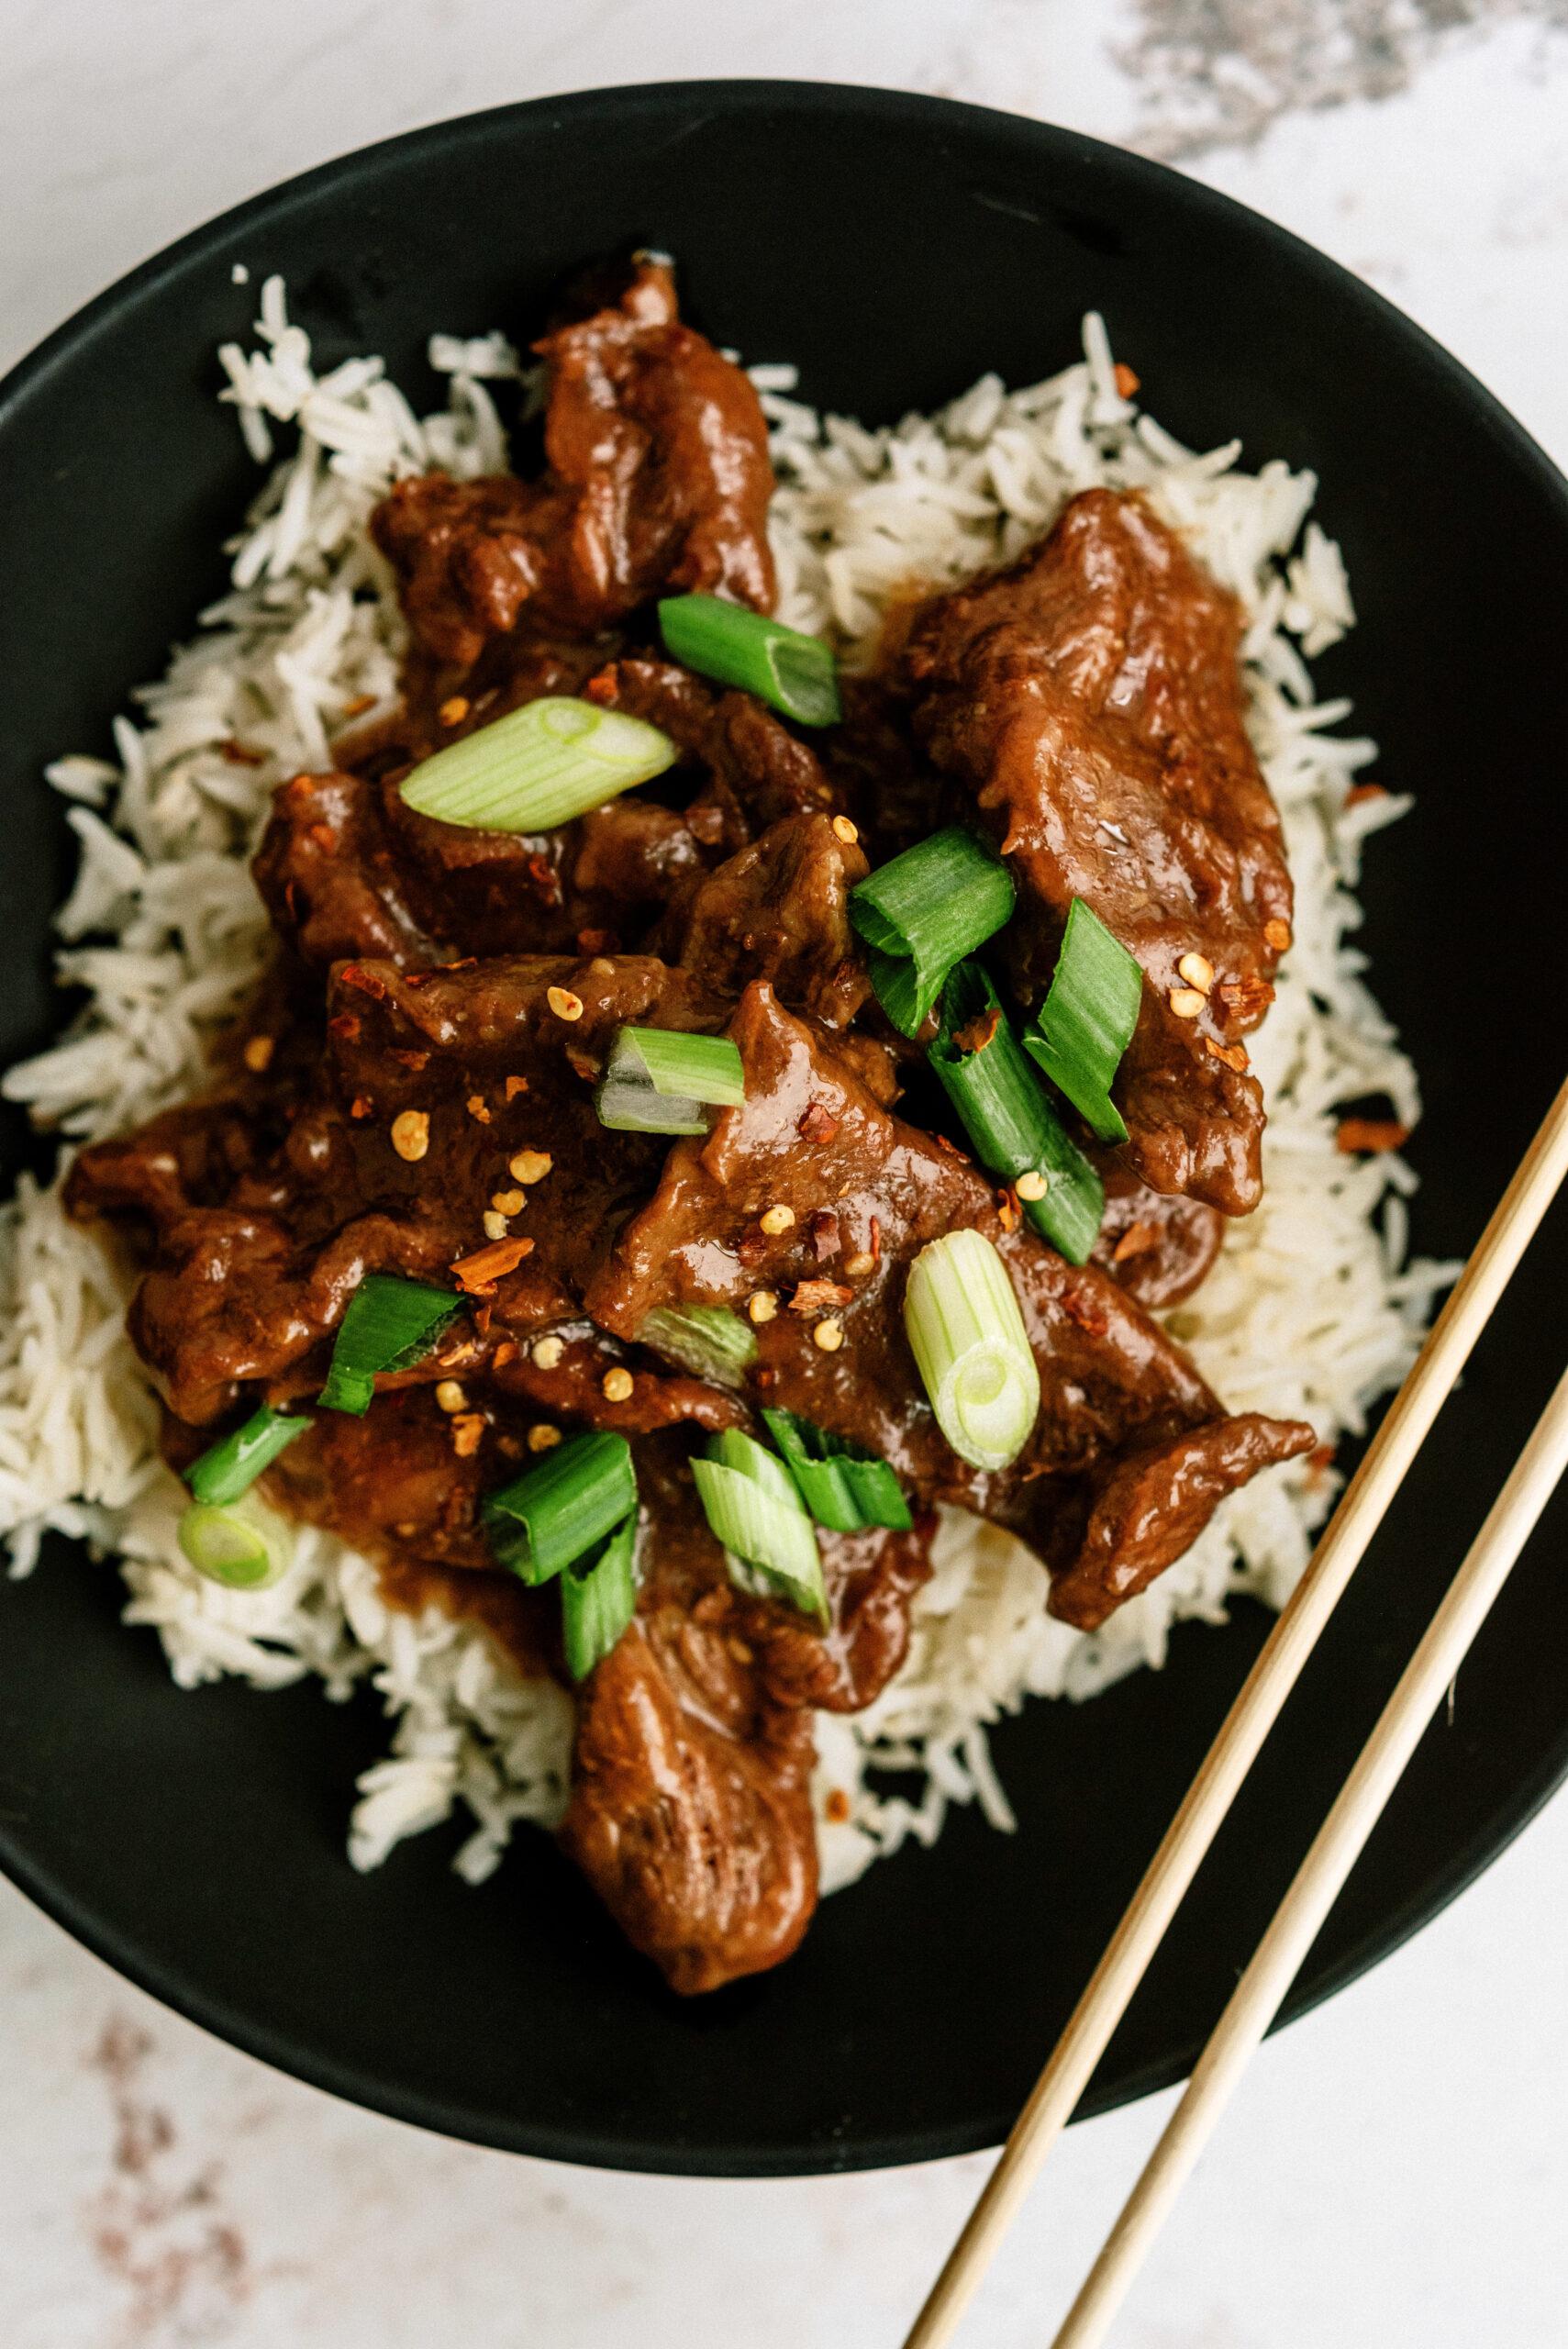 Instant Pot Mongolian Beef Recipe (Freezer Meal)